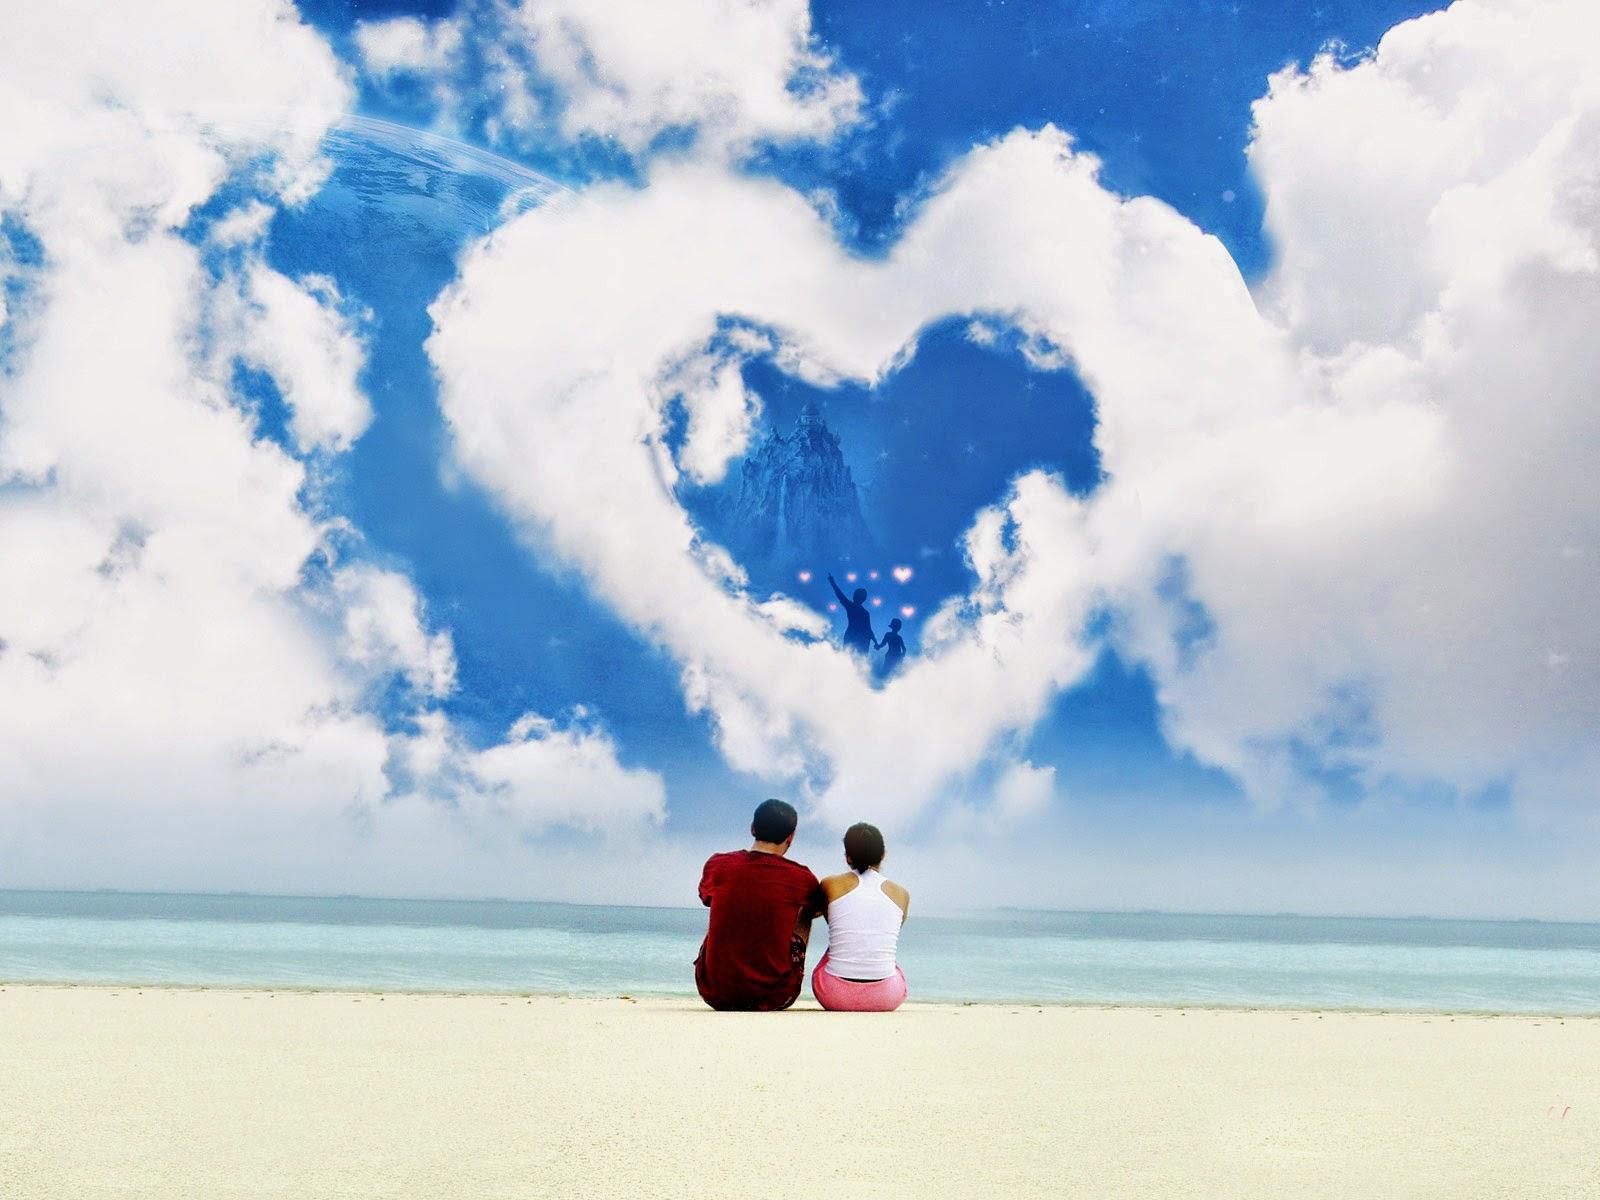 Media Pelajar Inilah Kata Kata Romantis Yang Bikin Ngakak